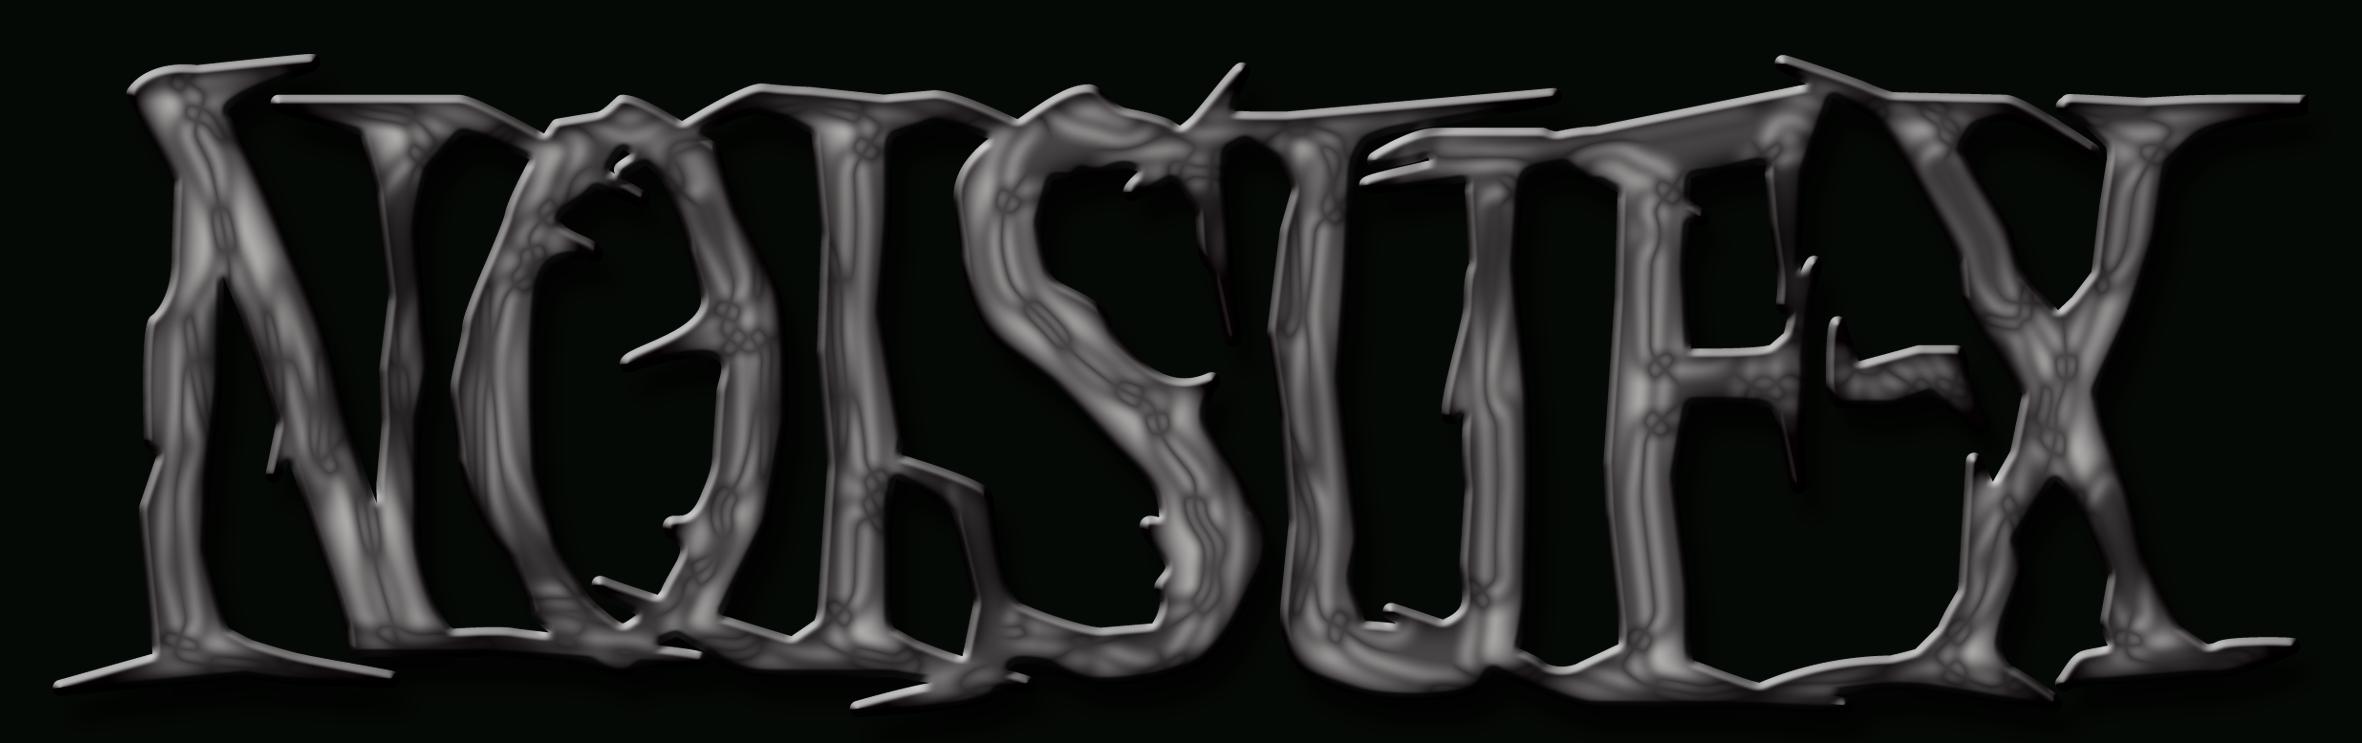 NOISUF-X